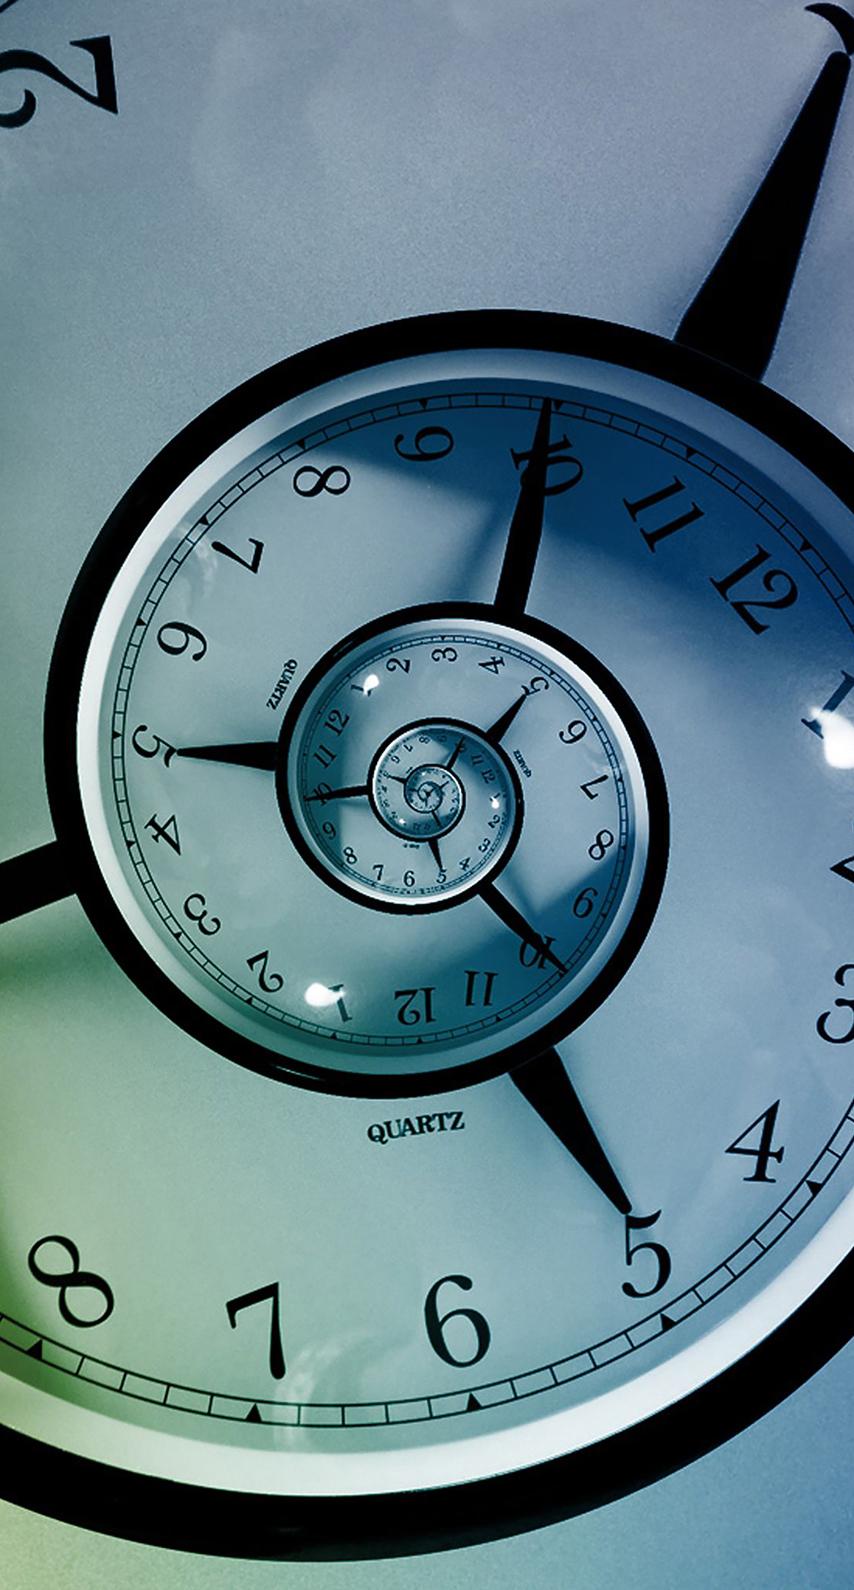 alarm clock, countdown